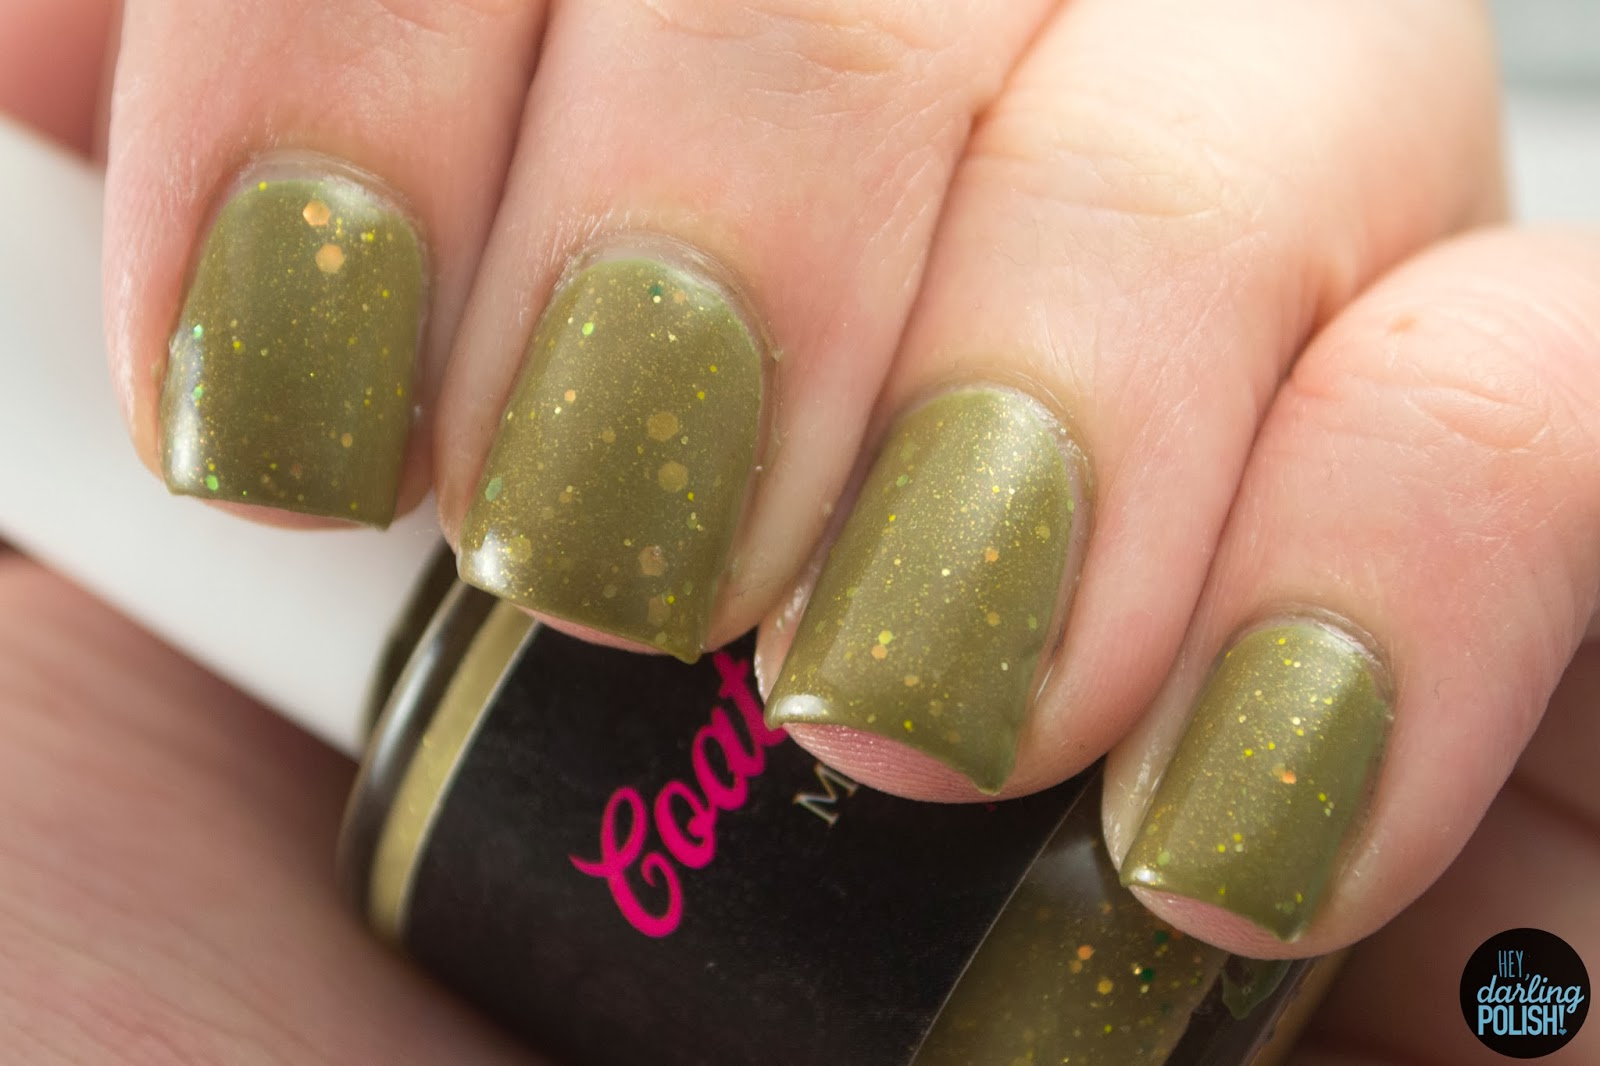 nails, nail polish, polish, indie, indie polish, coated in polish, army green, green, going to war, gold, hey darling polish